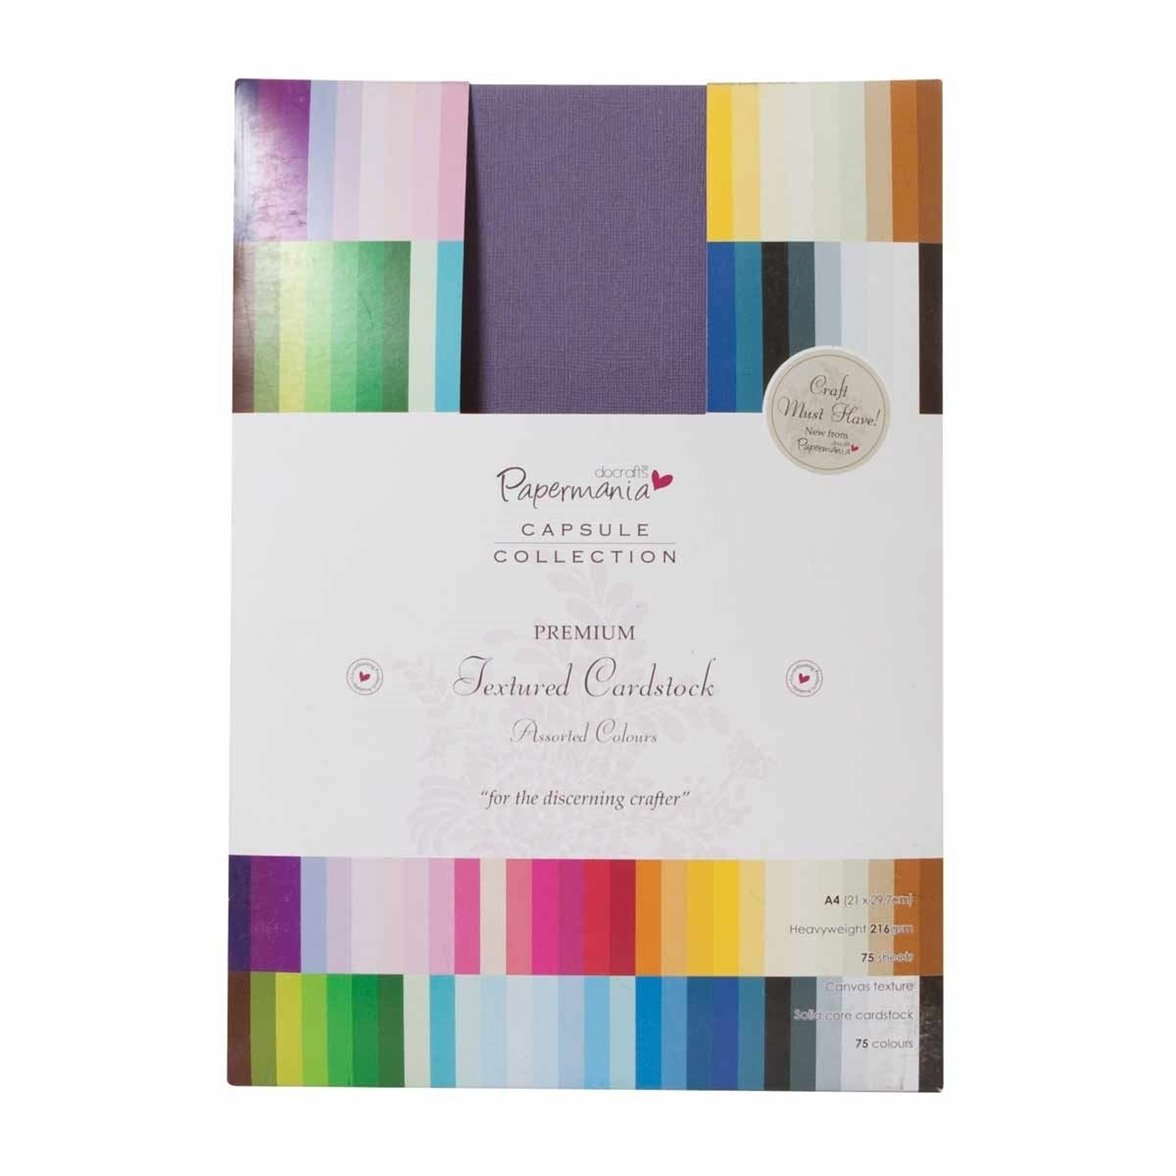 Pack of 75 OfficeCentre Docrafts A4 Premium Cardstock Textured Capsule Multicolour